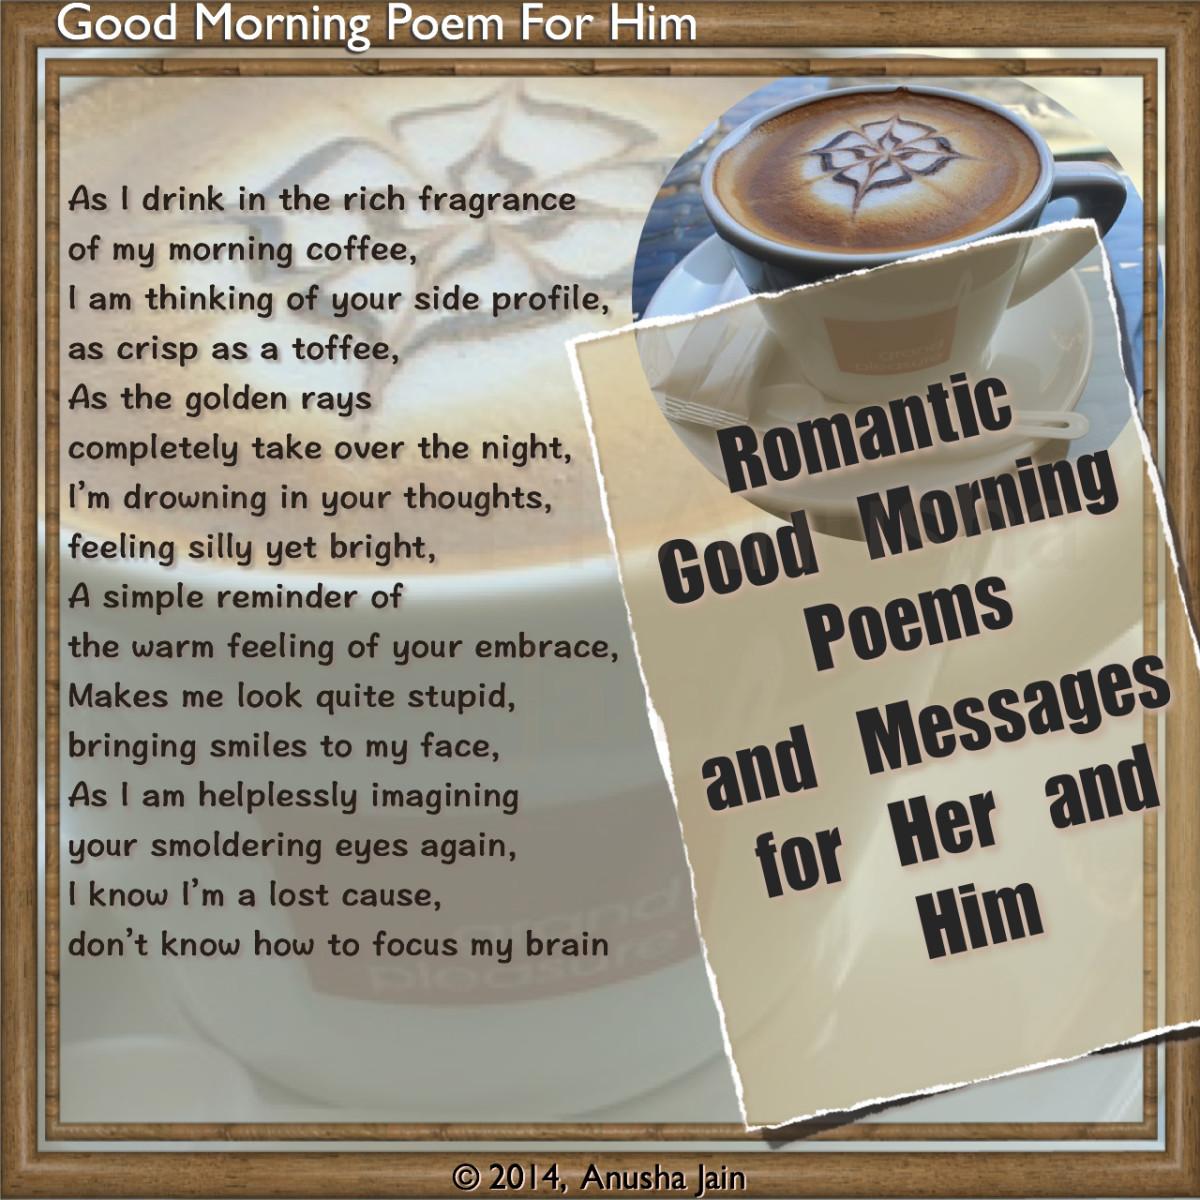 Good Morning Poems For Him Good morning - romantic poem